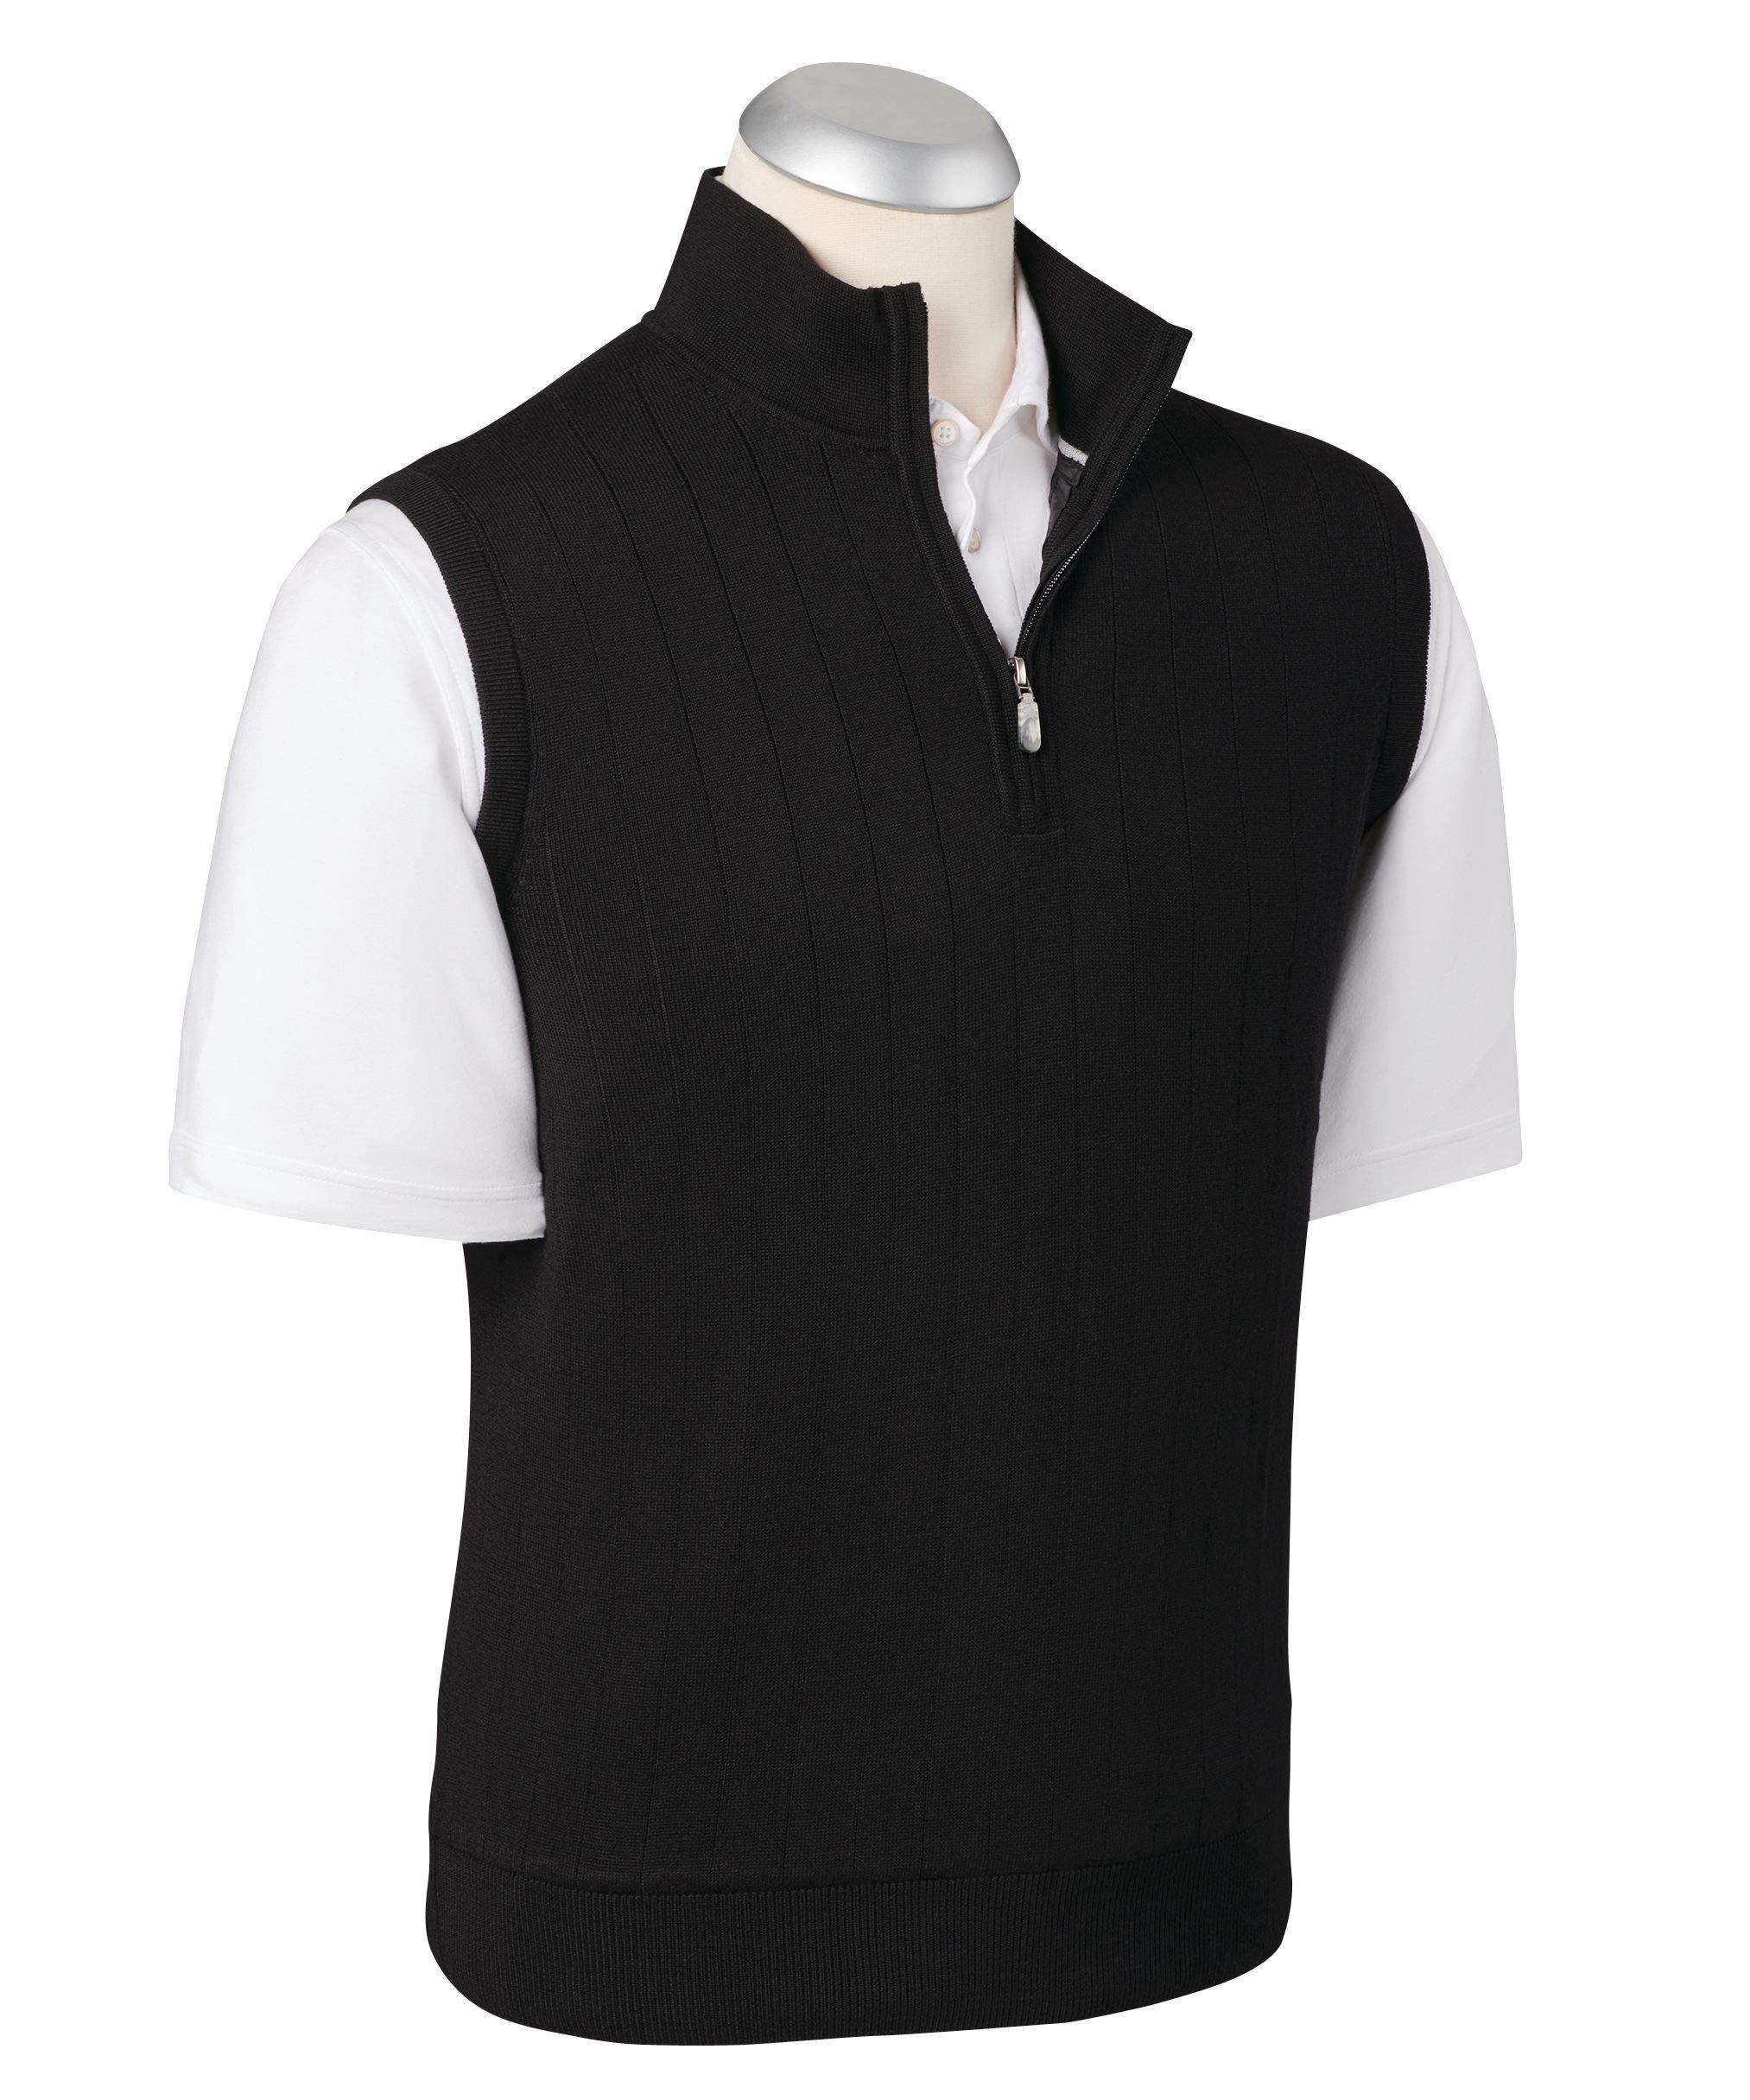 Lux Pima Leaderboard 1/4 Zip Vest Black by Bobby Jones